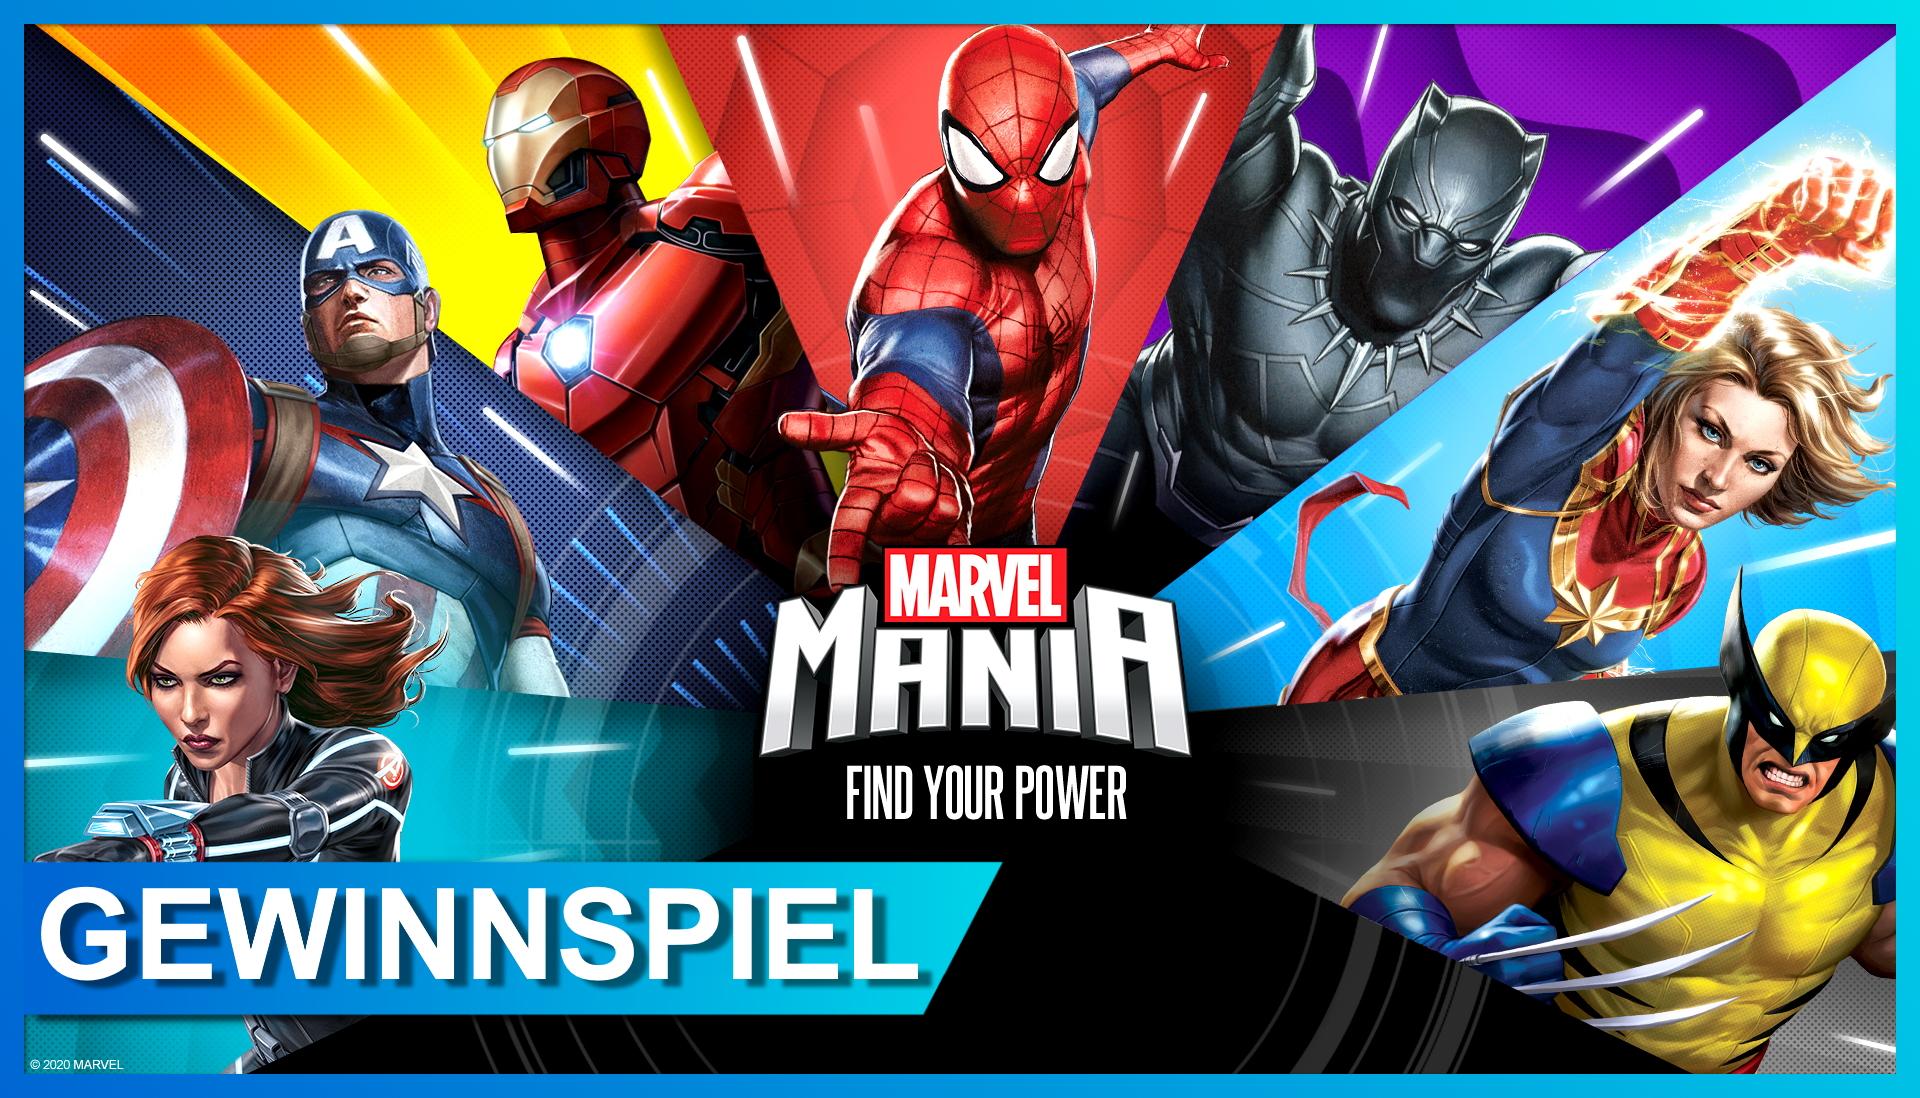 Marvel Mania Gewinnspiel